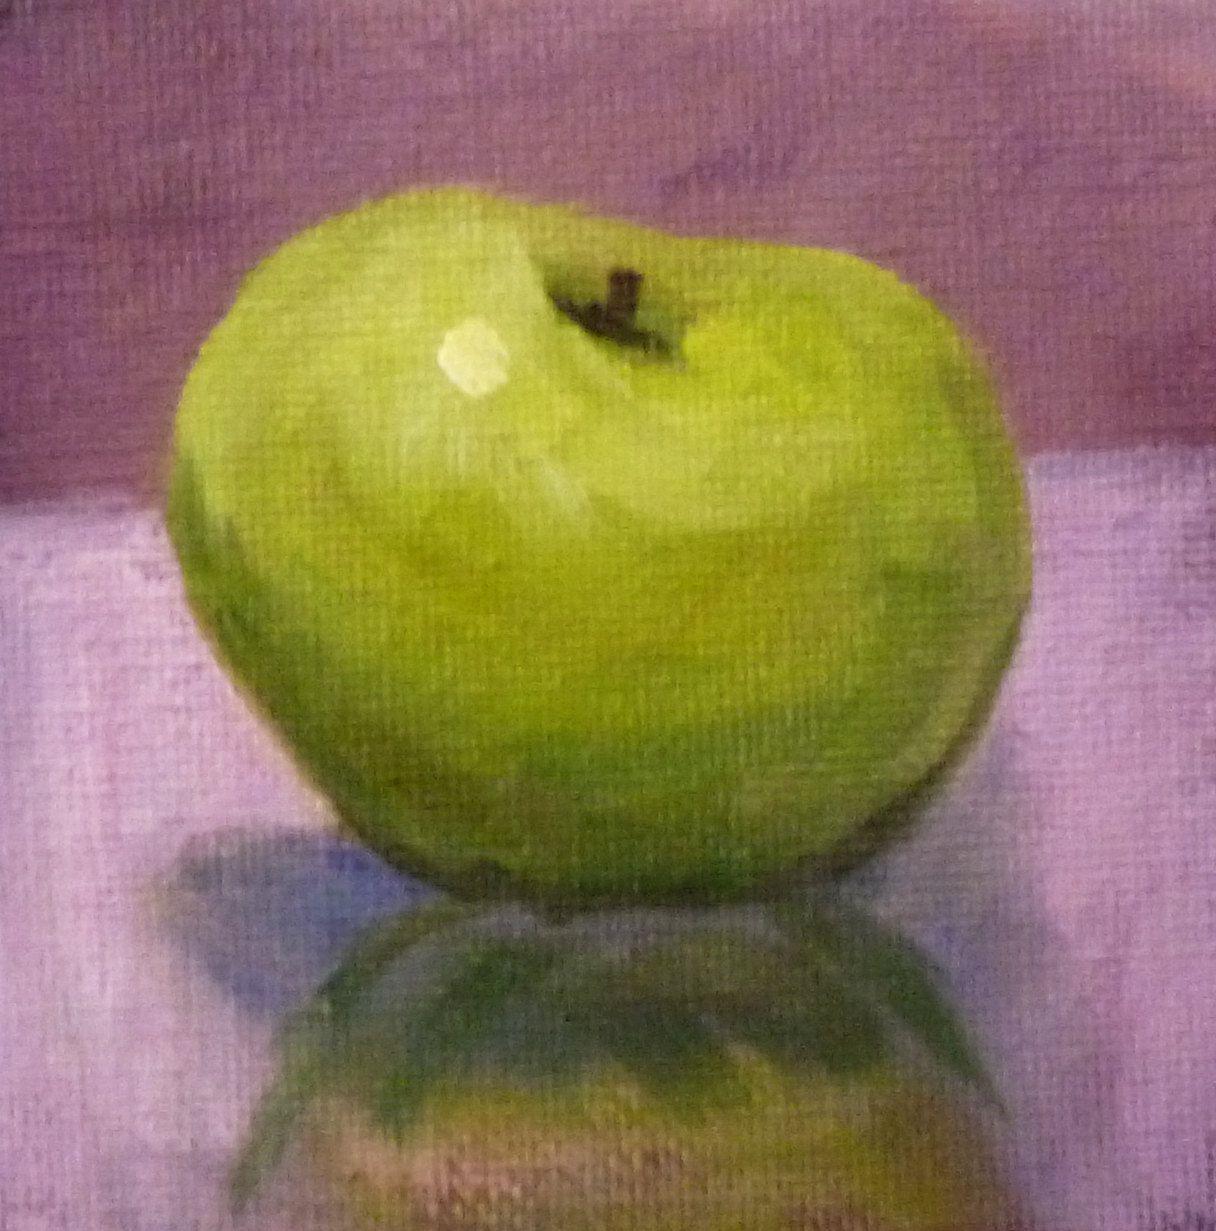 Oil Painting, Original, Miniature 4x4, Still Life on Canvas, Green ...